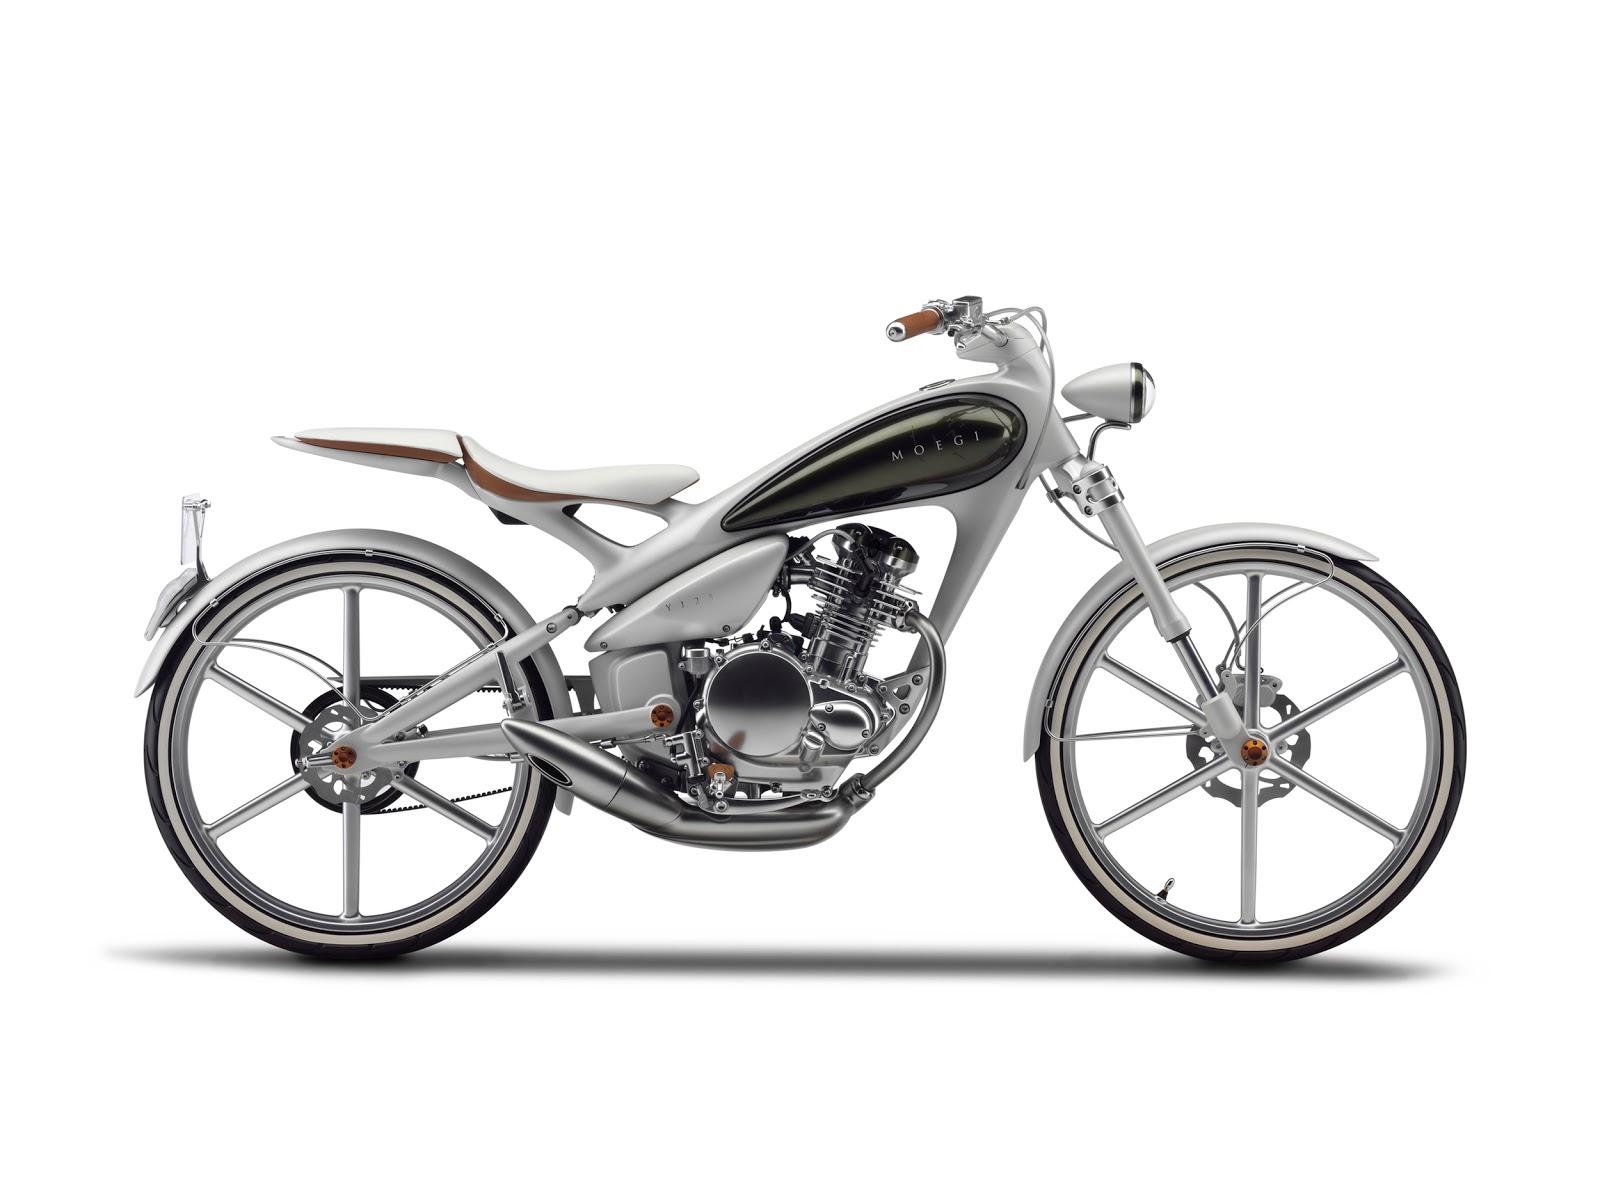 Planet Japan Blog Yamaha Y125 Moegi Concept Tokyo Motor